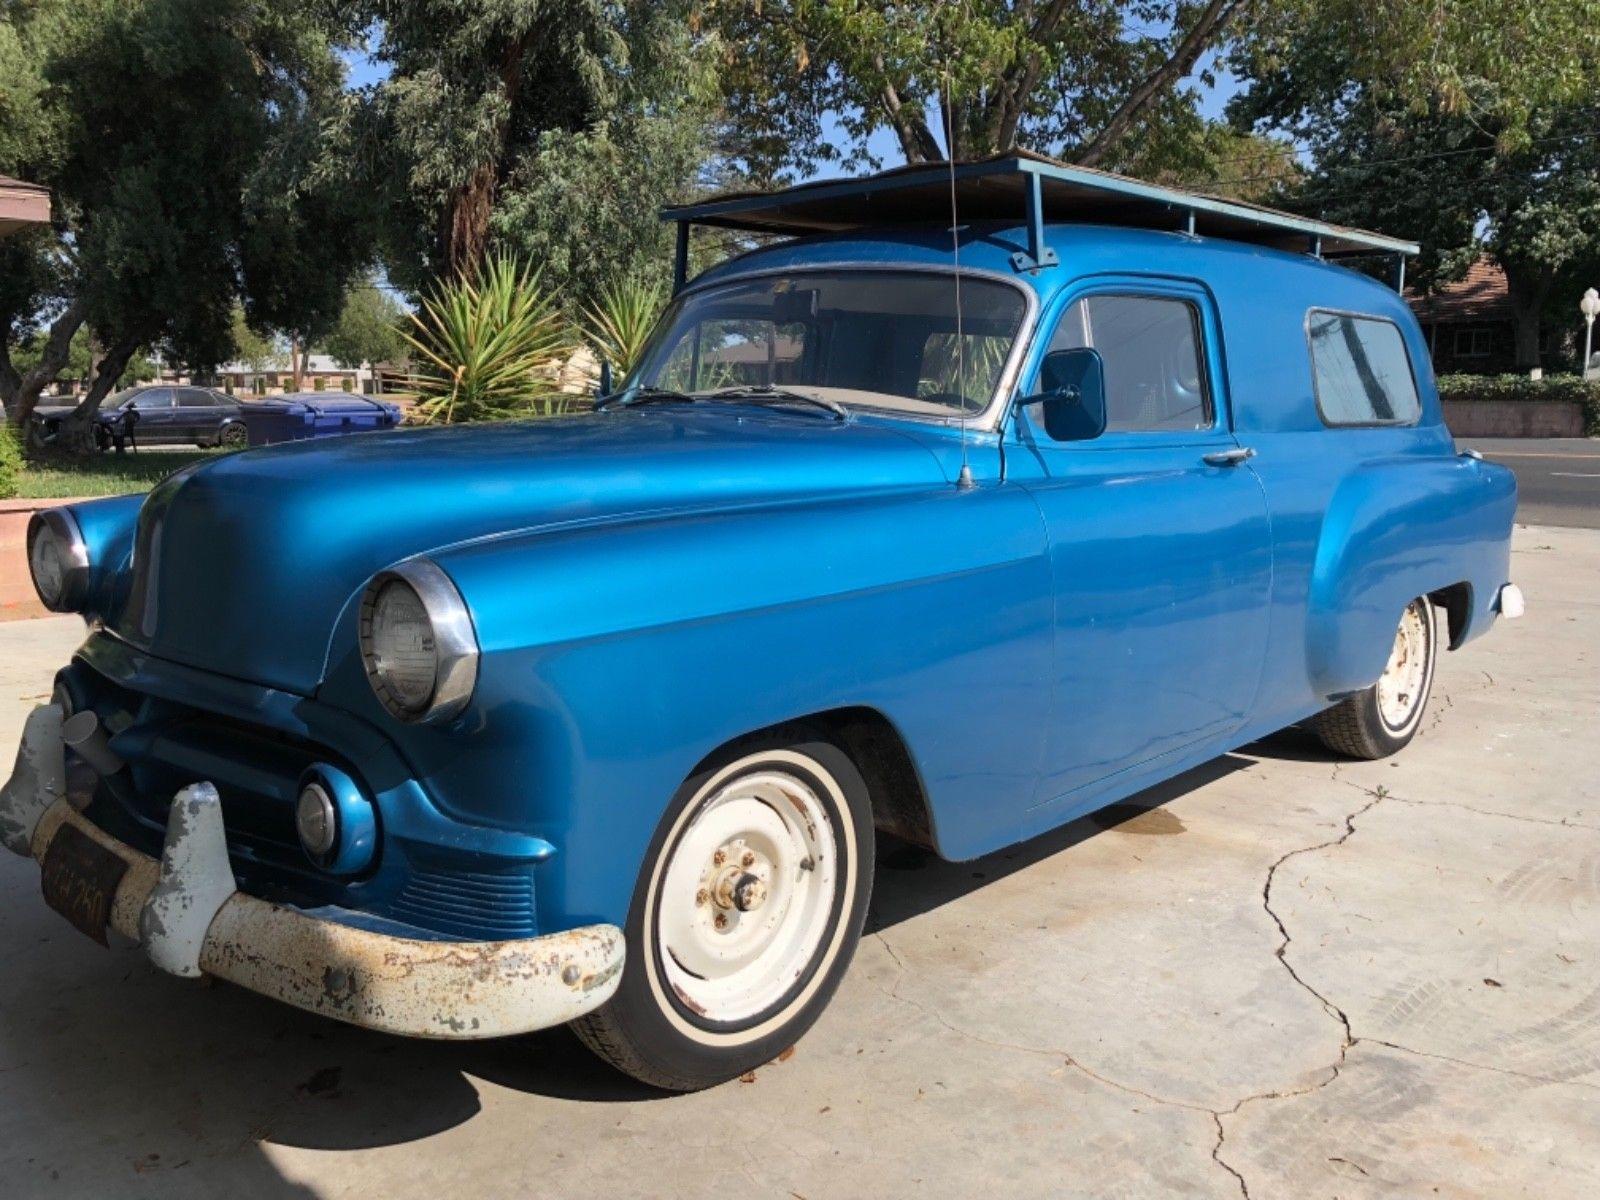 Amazing 1953 Chevrolet Bel Air 150 210 1953 Chevy Station Wagon 2 Door 2018